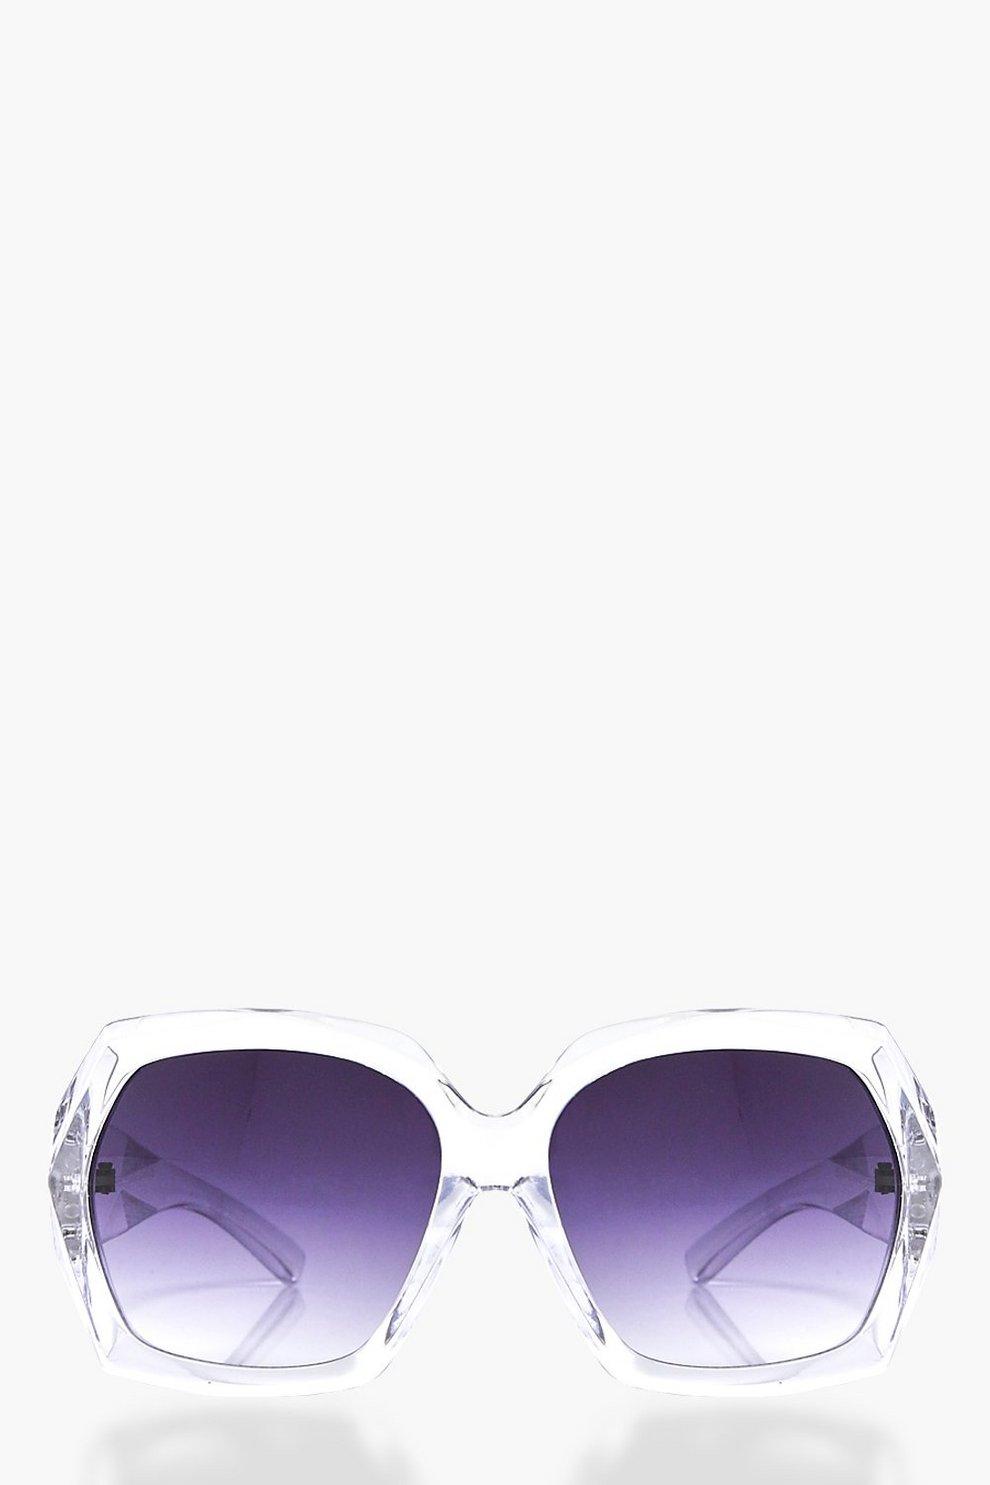 Faye Clear Frame Oversized fashion glasses | Boohoo